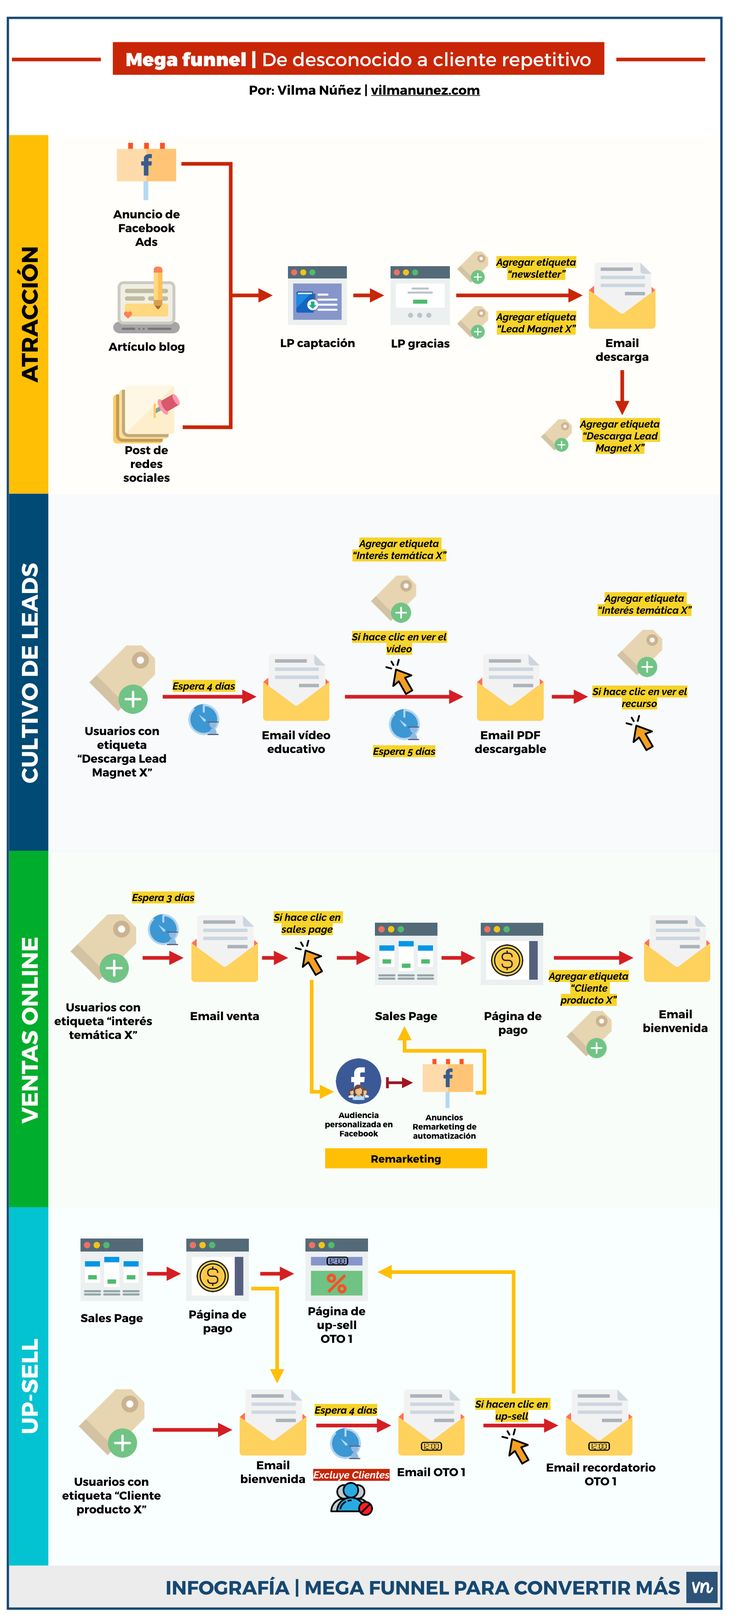 Advertising-Infographics-Una-guia-completa-para-crear-un-funnel Advertising Infographics : Una guía completa para crear un funnel o embudo de conversión que sí conviert...